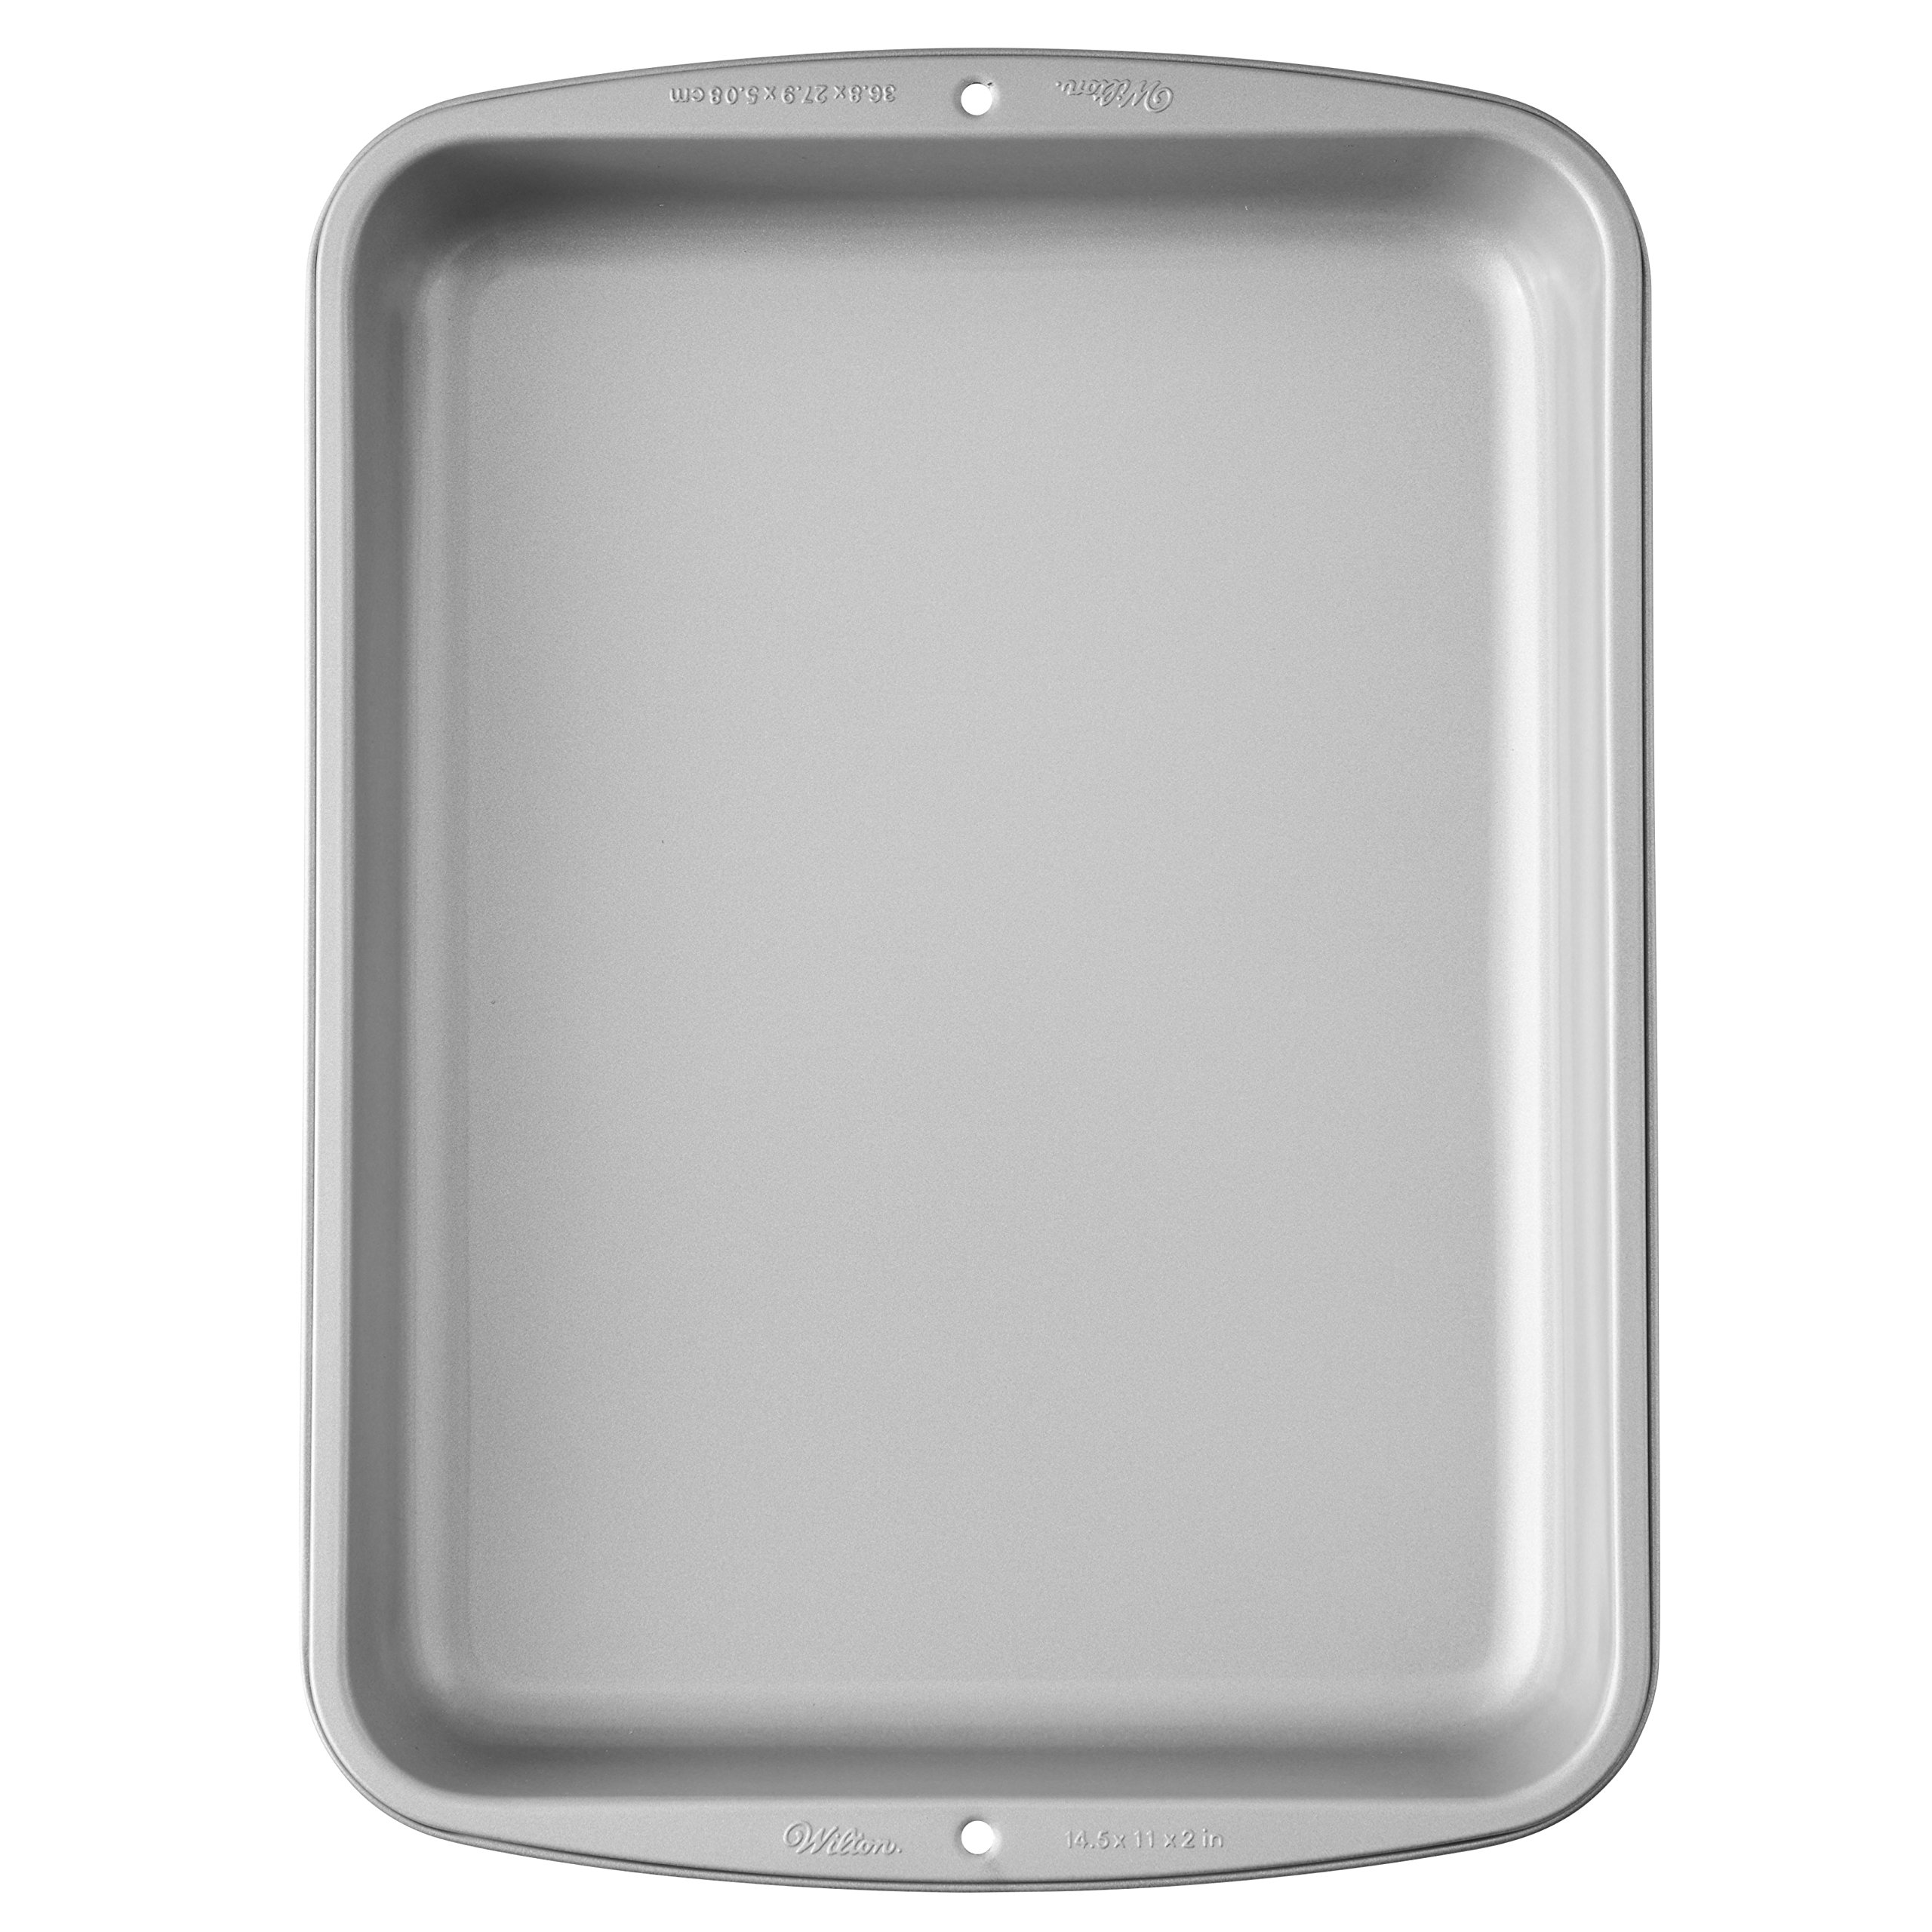 Wilton INDUSTRIES 2105-963 14.5x11 Lasagna Pan by Wilton